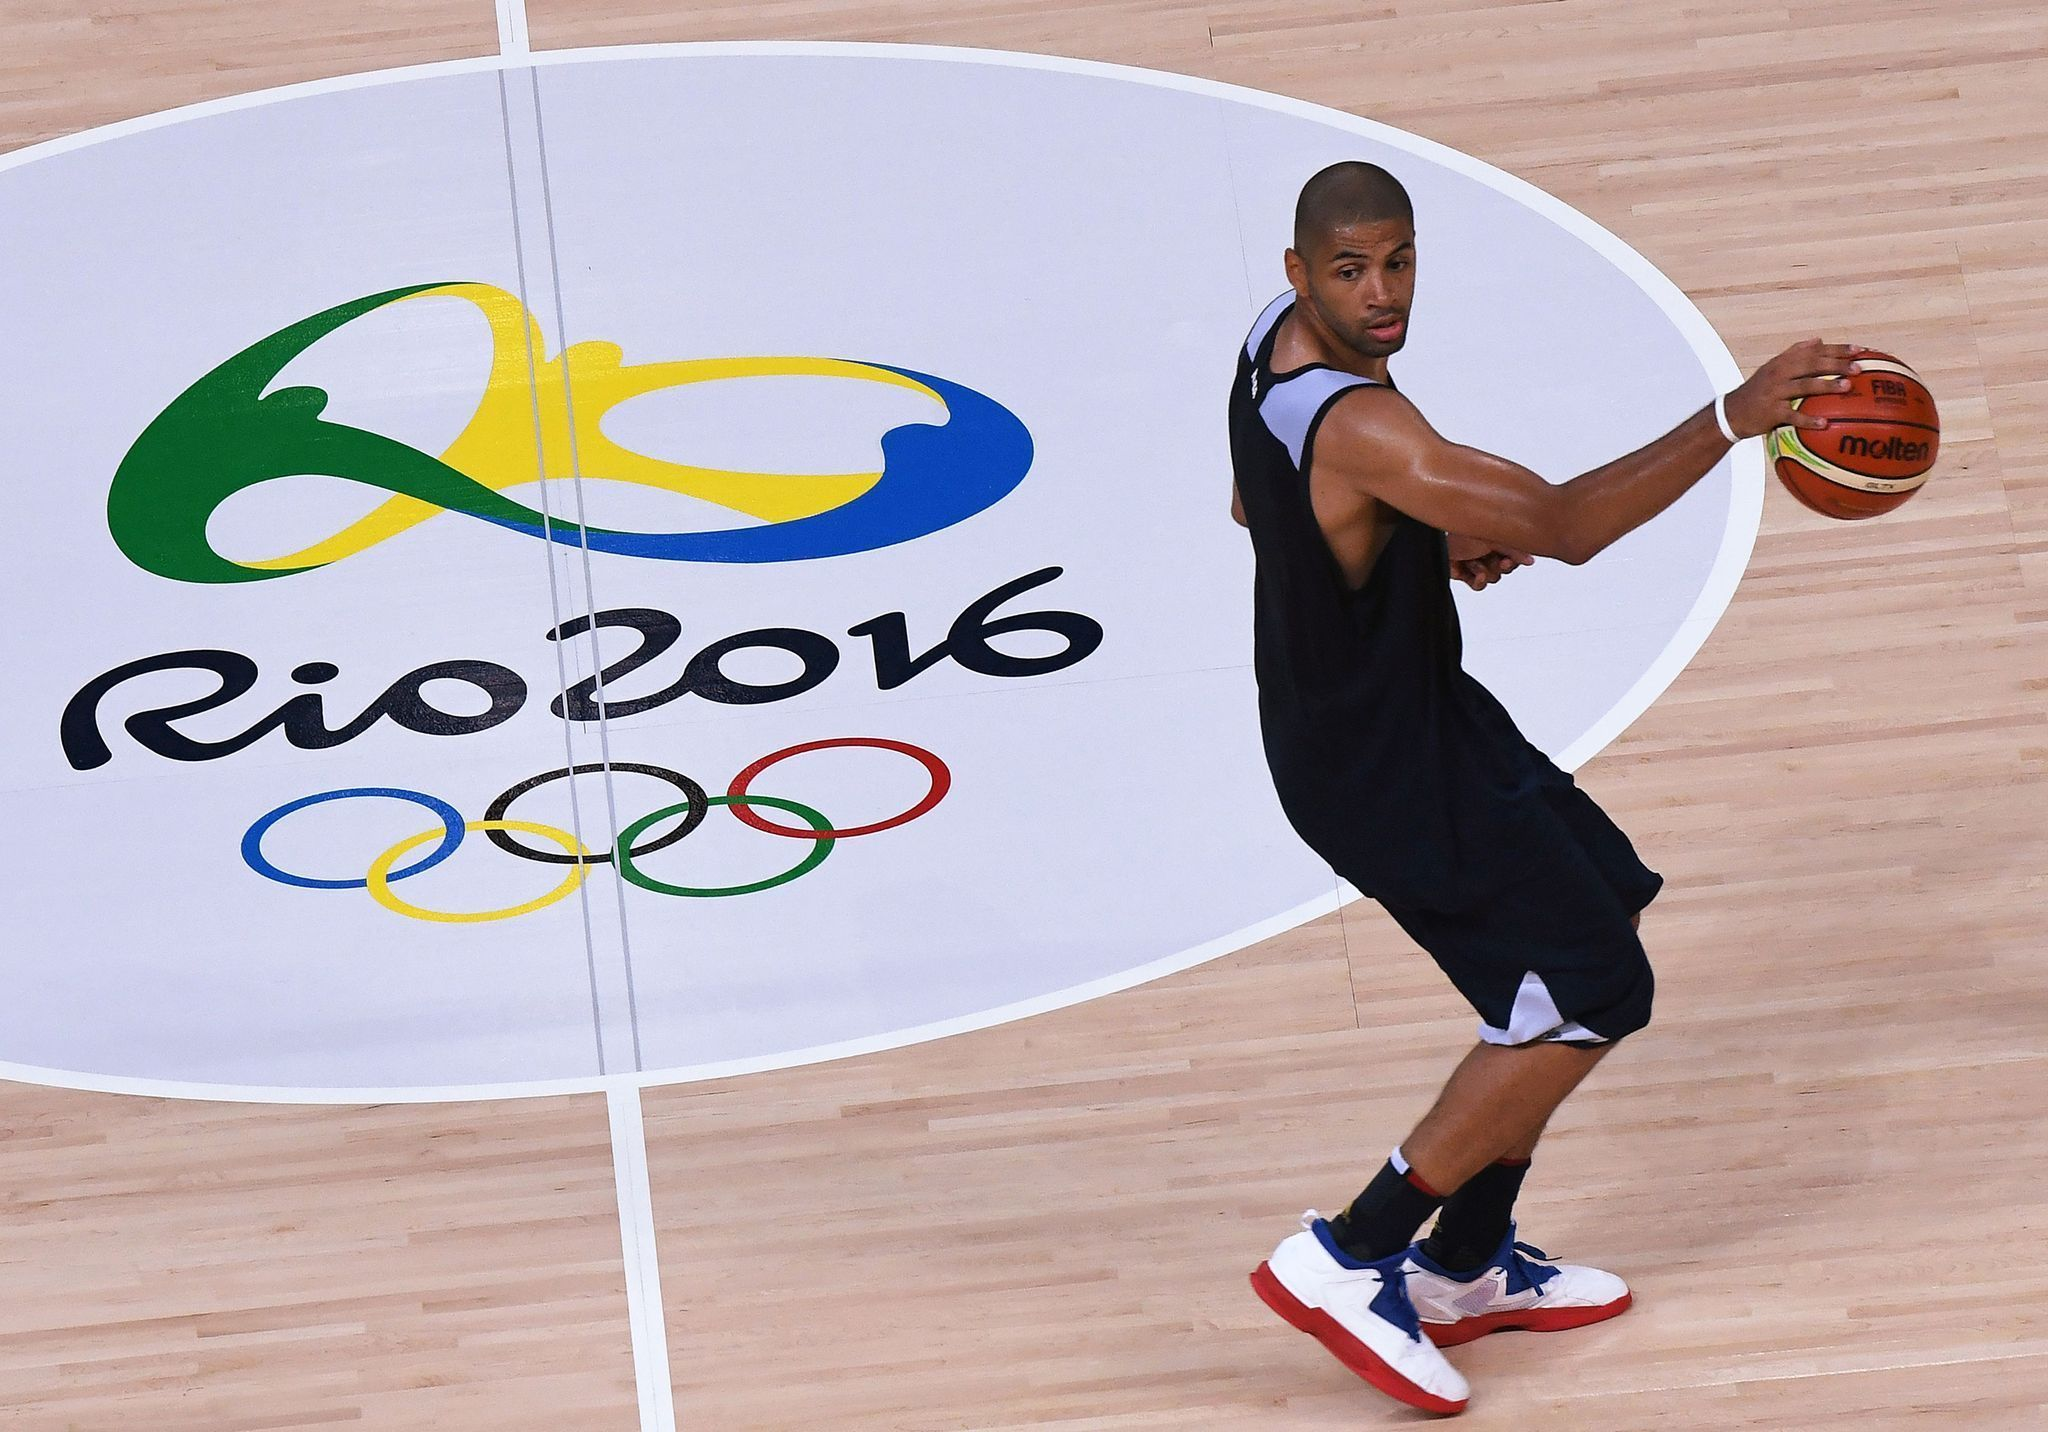 bovada sportsbook payout basketball rio 2016 bracket